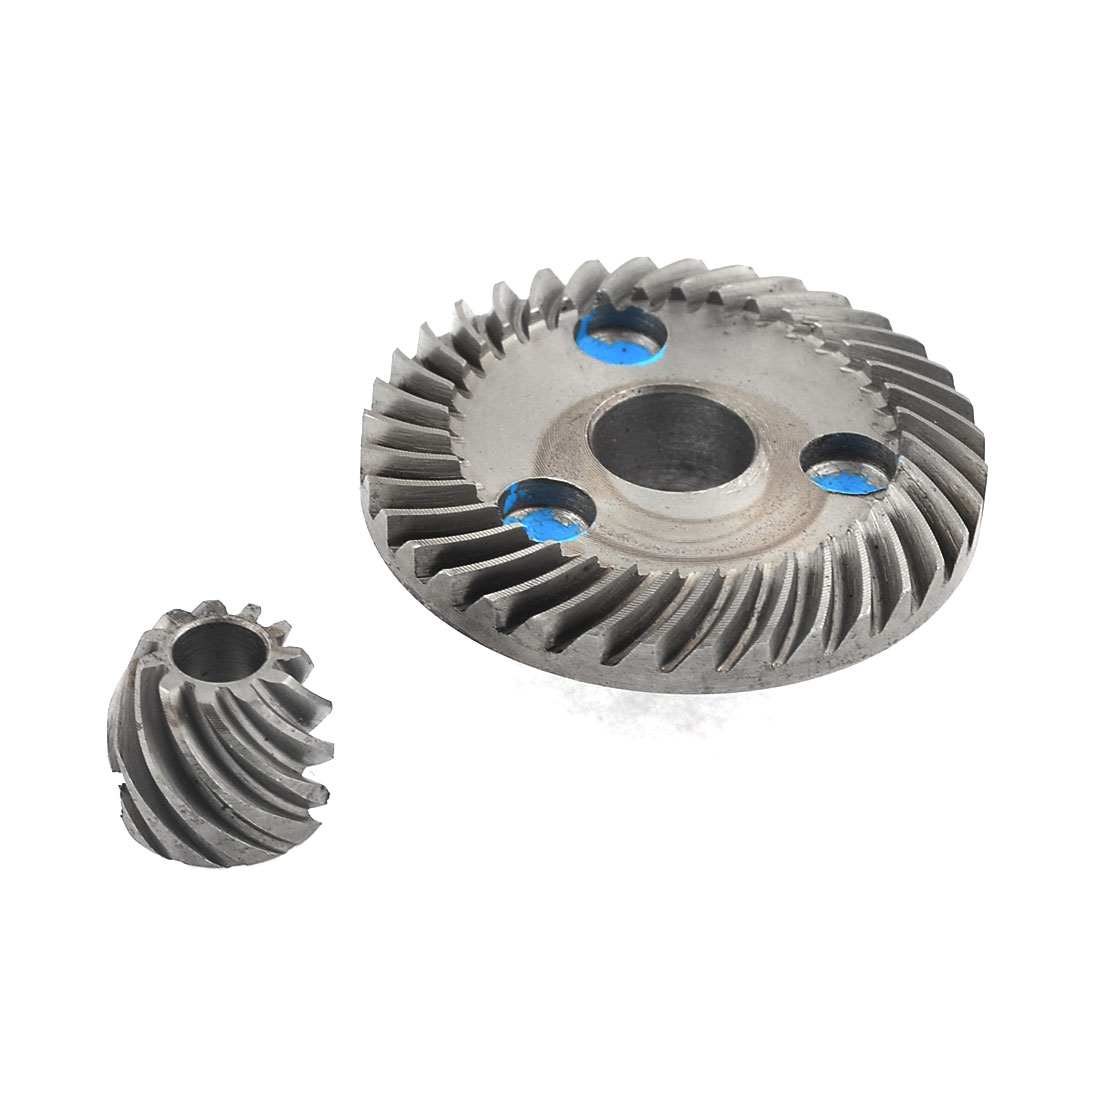 Repair Part Ring Dear 46mm x 12mm x 14mm Pinion Spiral Bevel Gear Set for Matika 9523